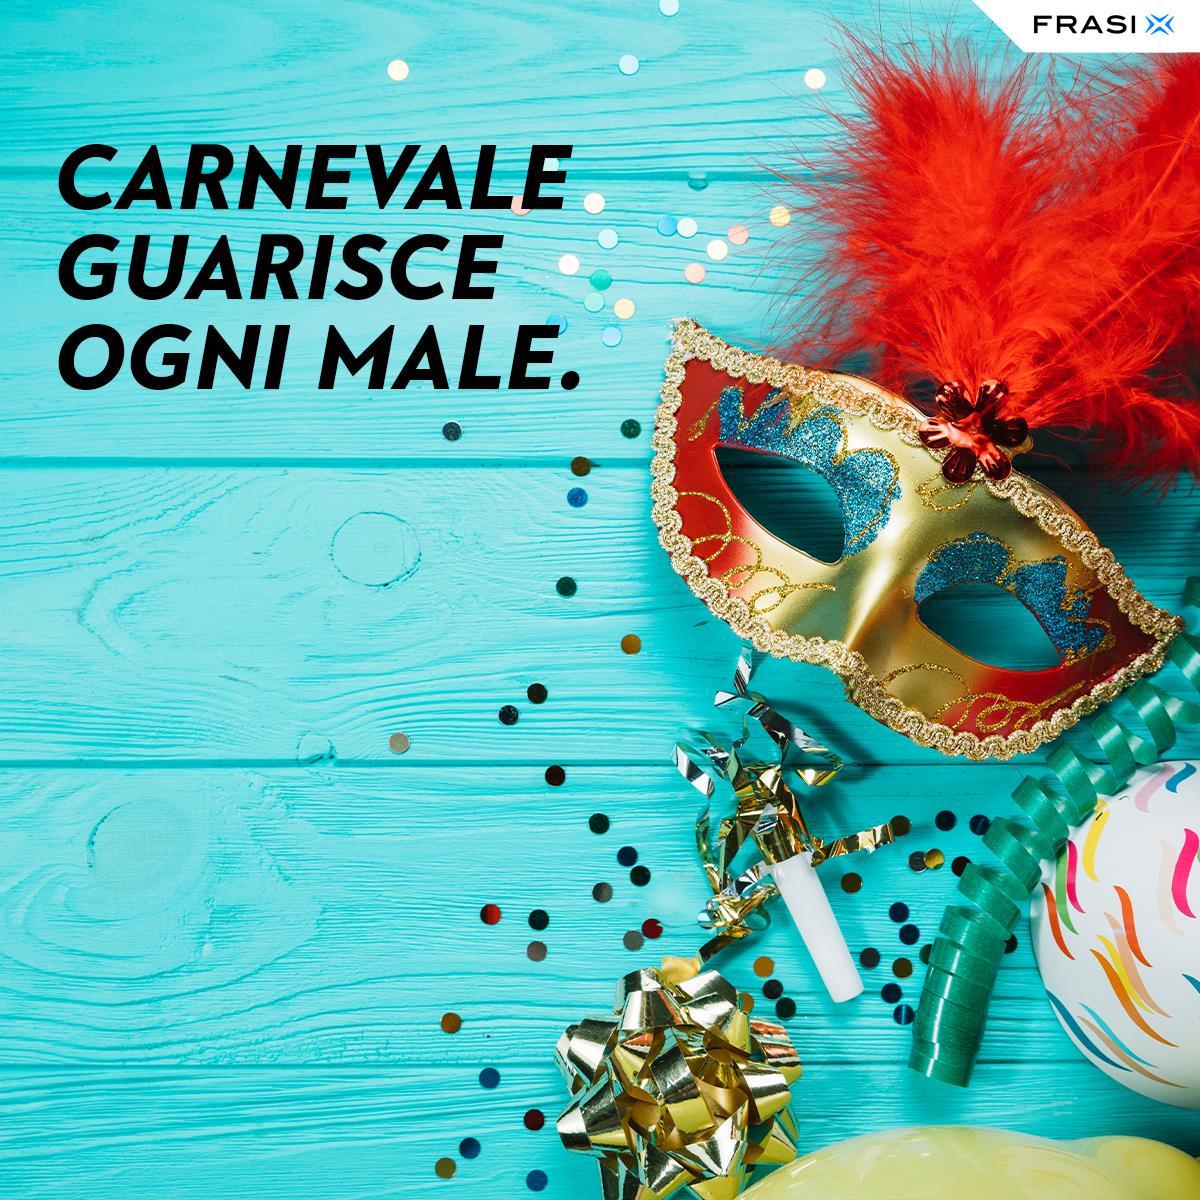 Carnevale guarisce ogni male frasi